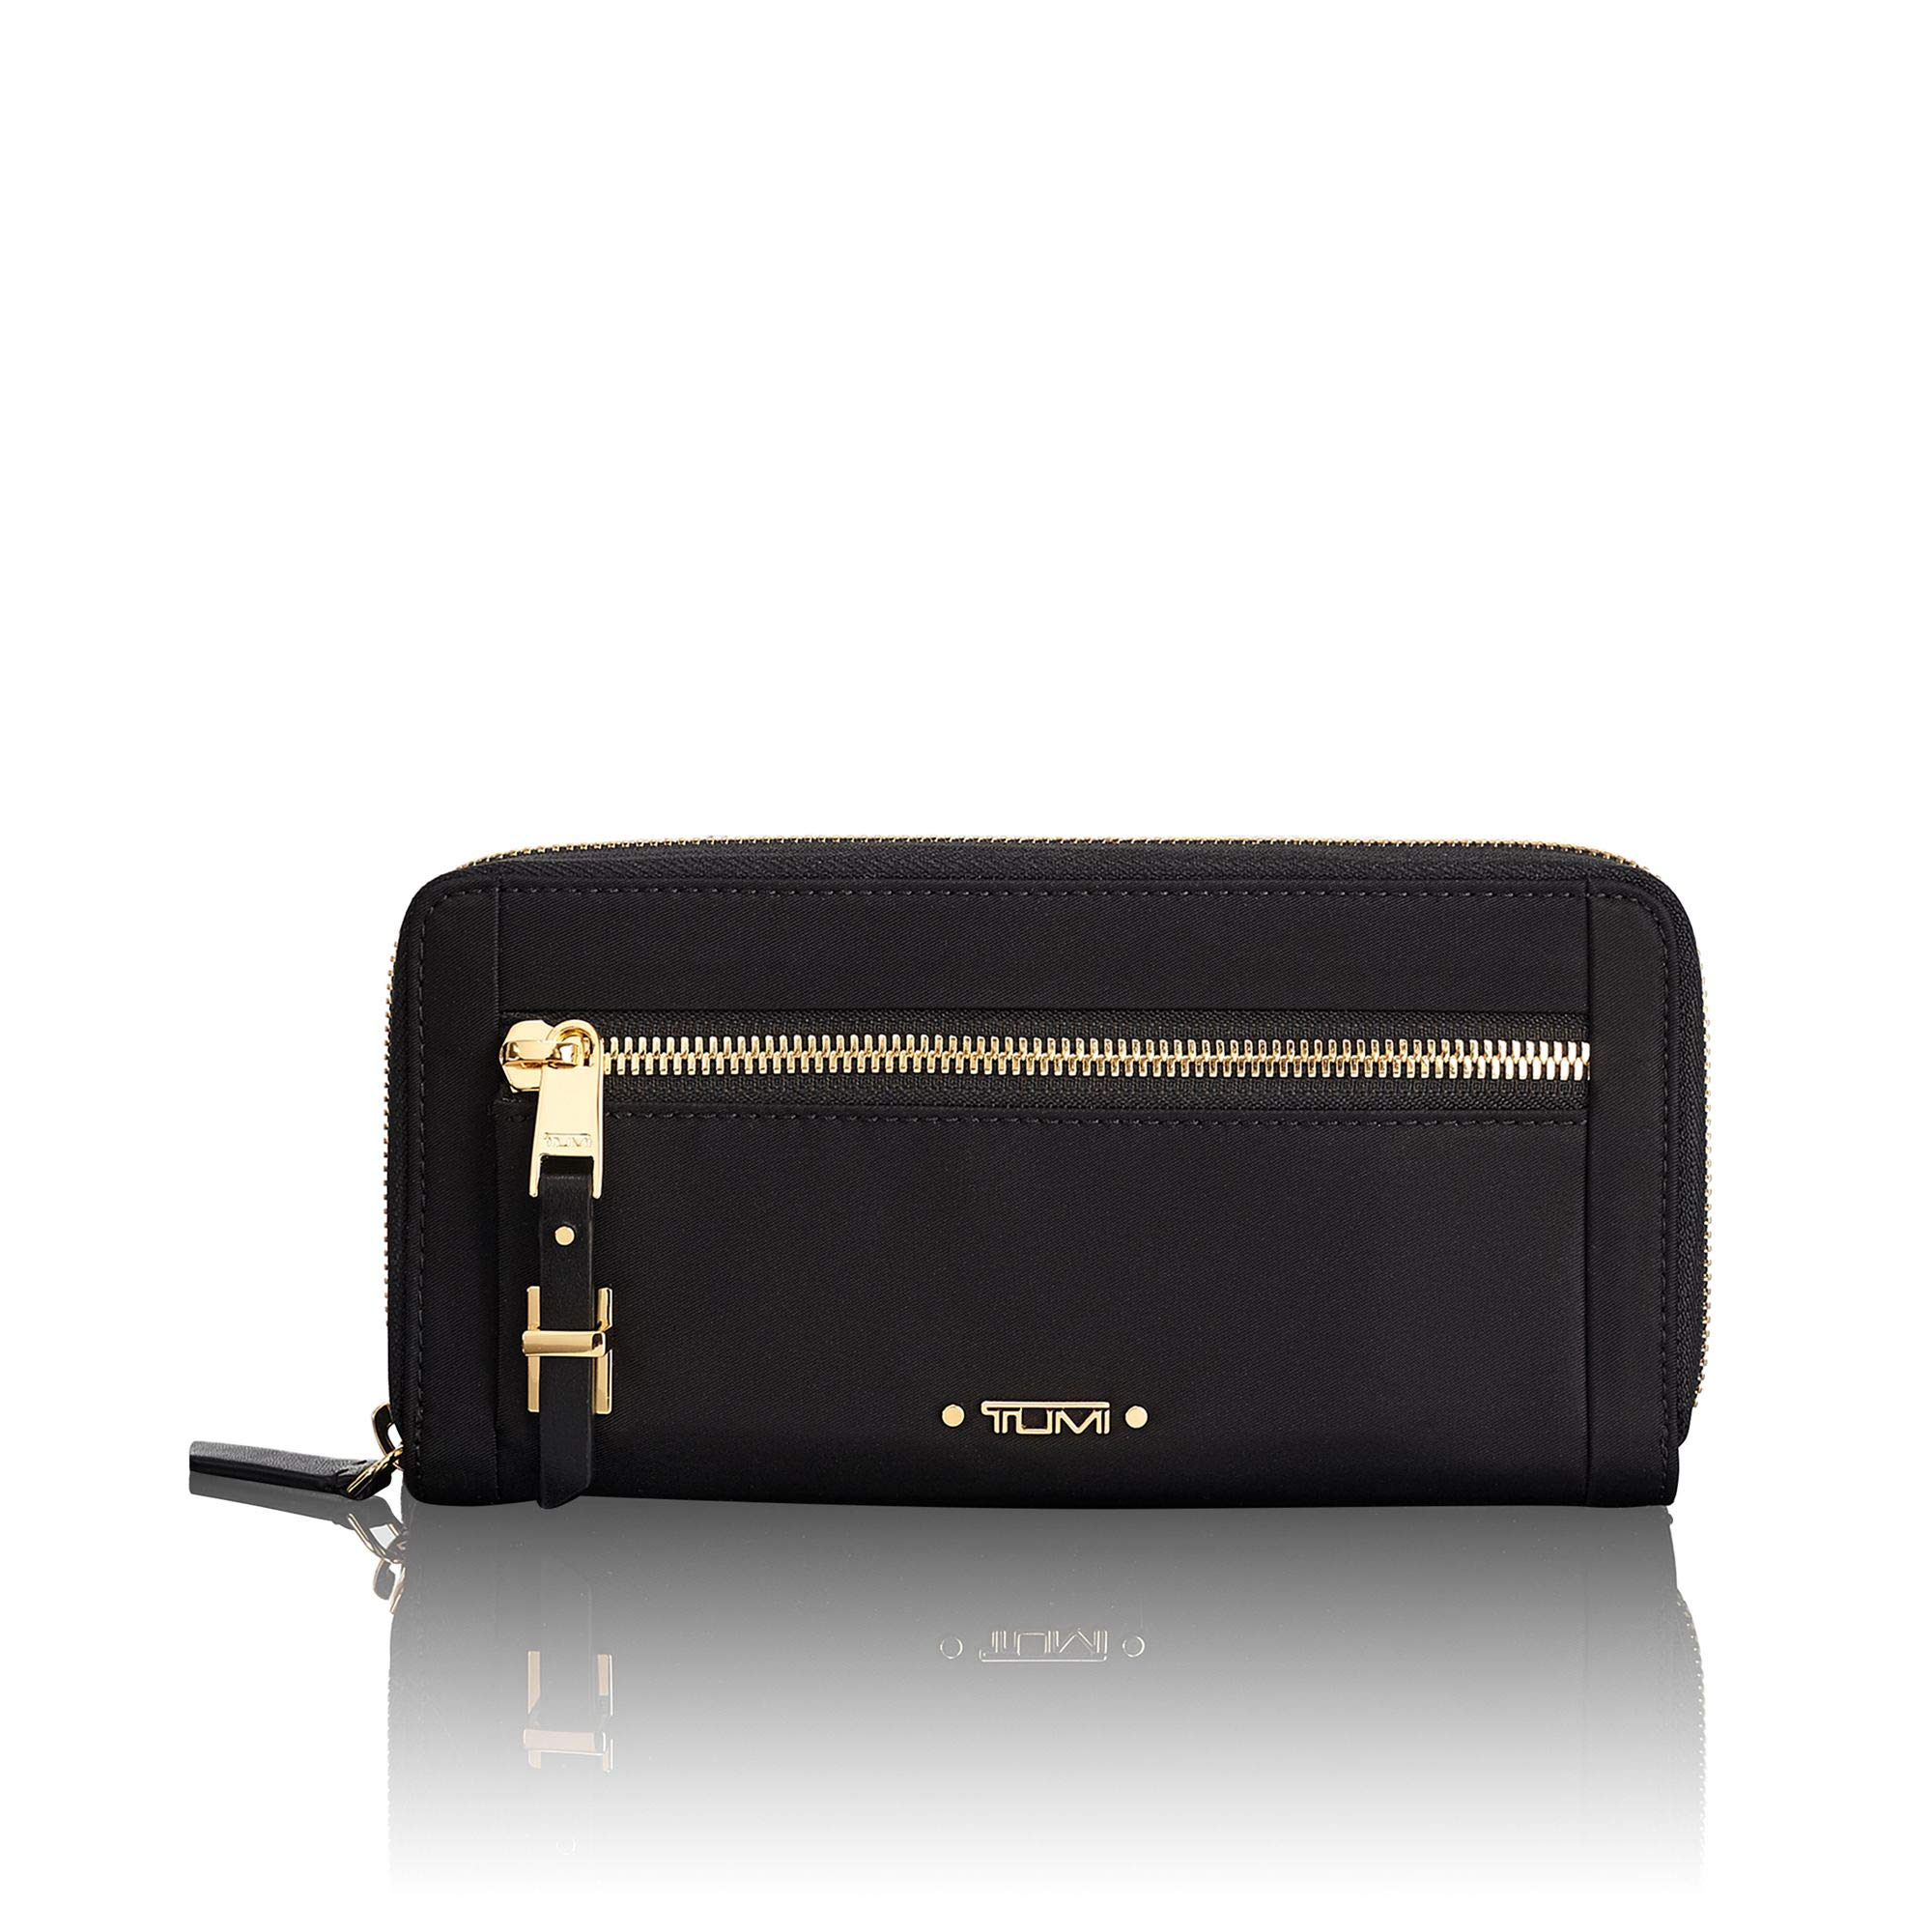 TUMI - Voyageur Zip-Around Continental Wallet - Card Holder for Women - Black by TUMI